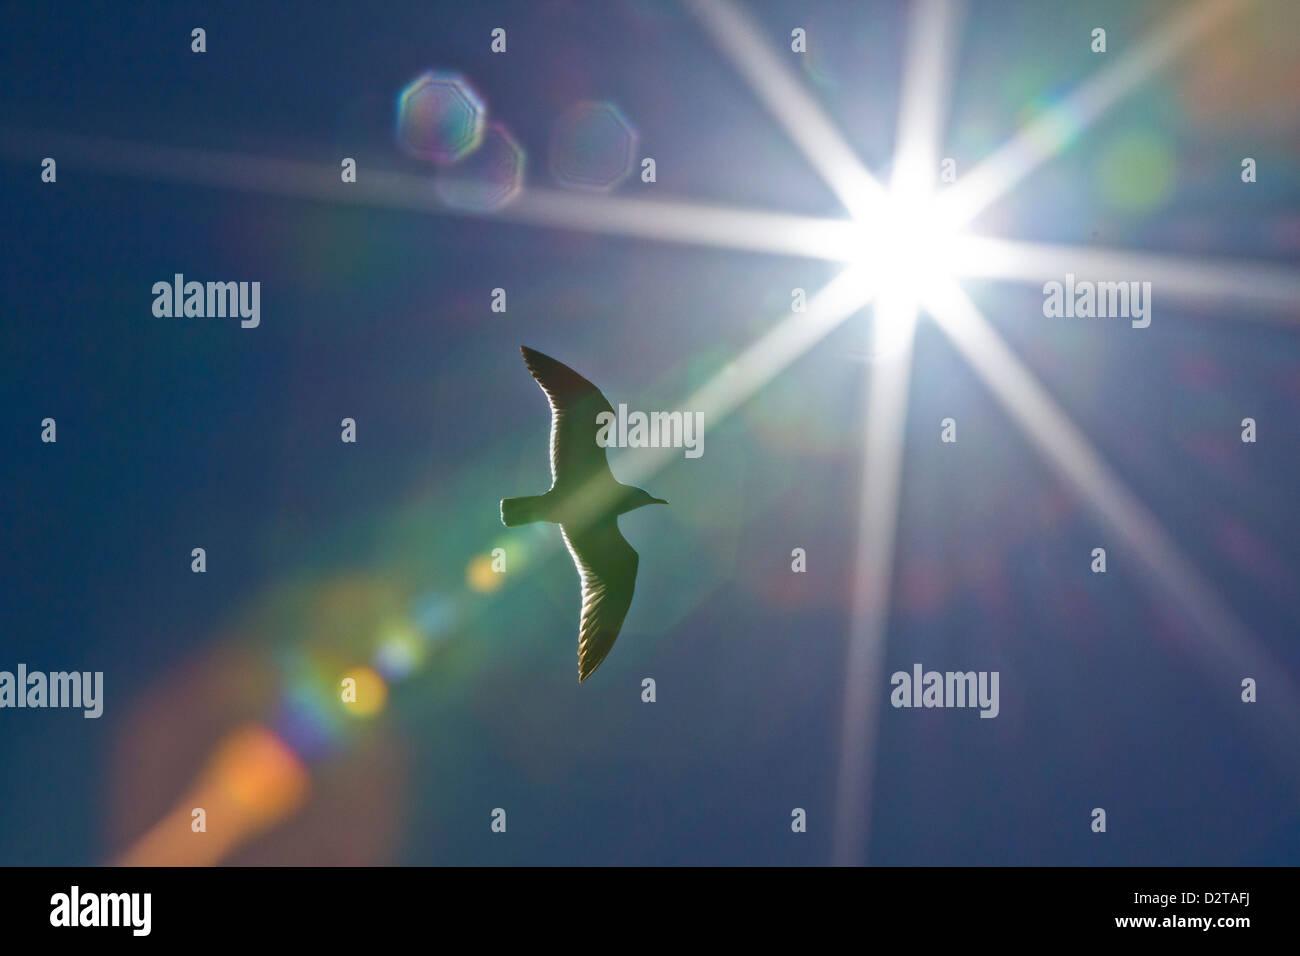 Heermann's gull (Larus heermanni), Isla Rasa, Gulf of California (Sea of Cortez), Mexico, North America - Stock Image